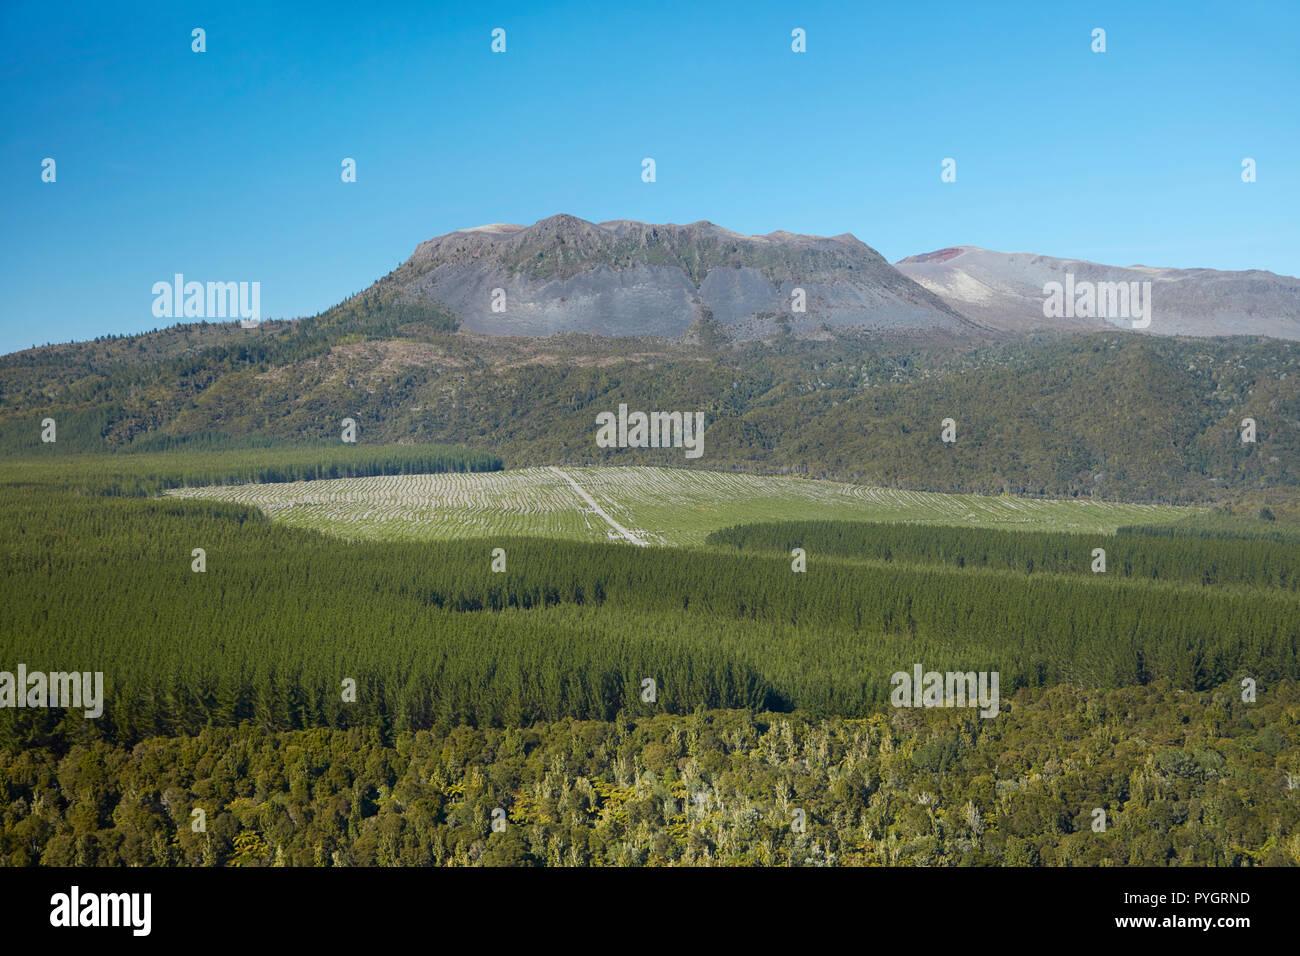 Mount Tarawera, and native and pine forests, near Rotorua, North Island, New Zealand - aerial - Stock Image